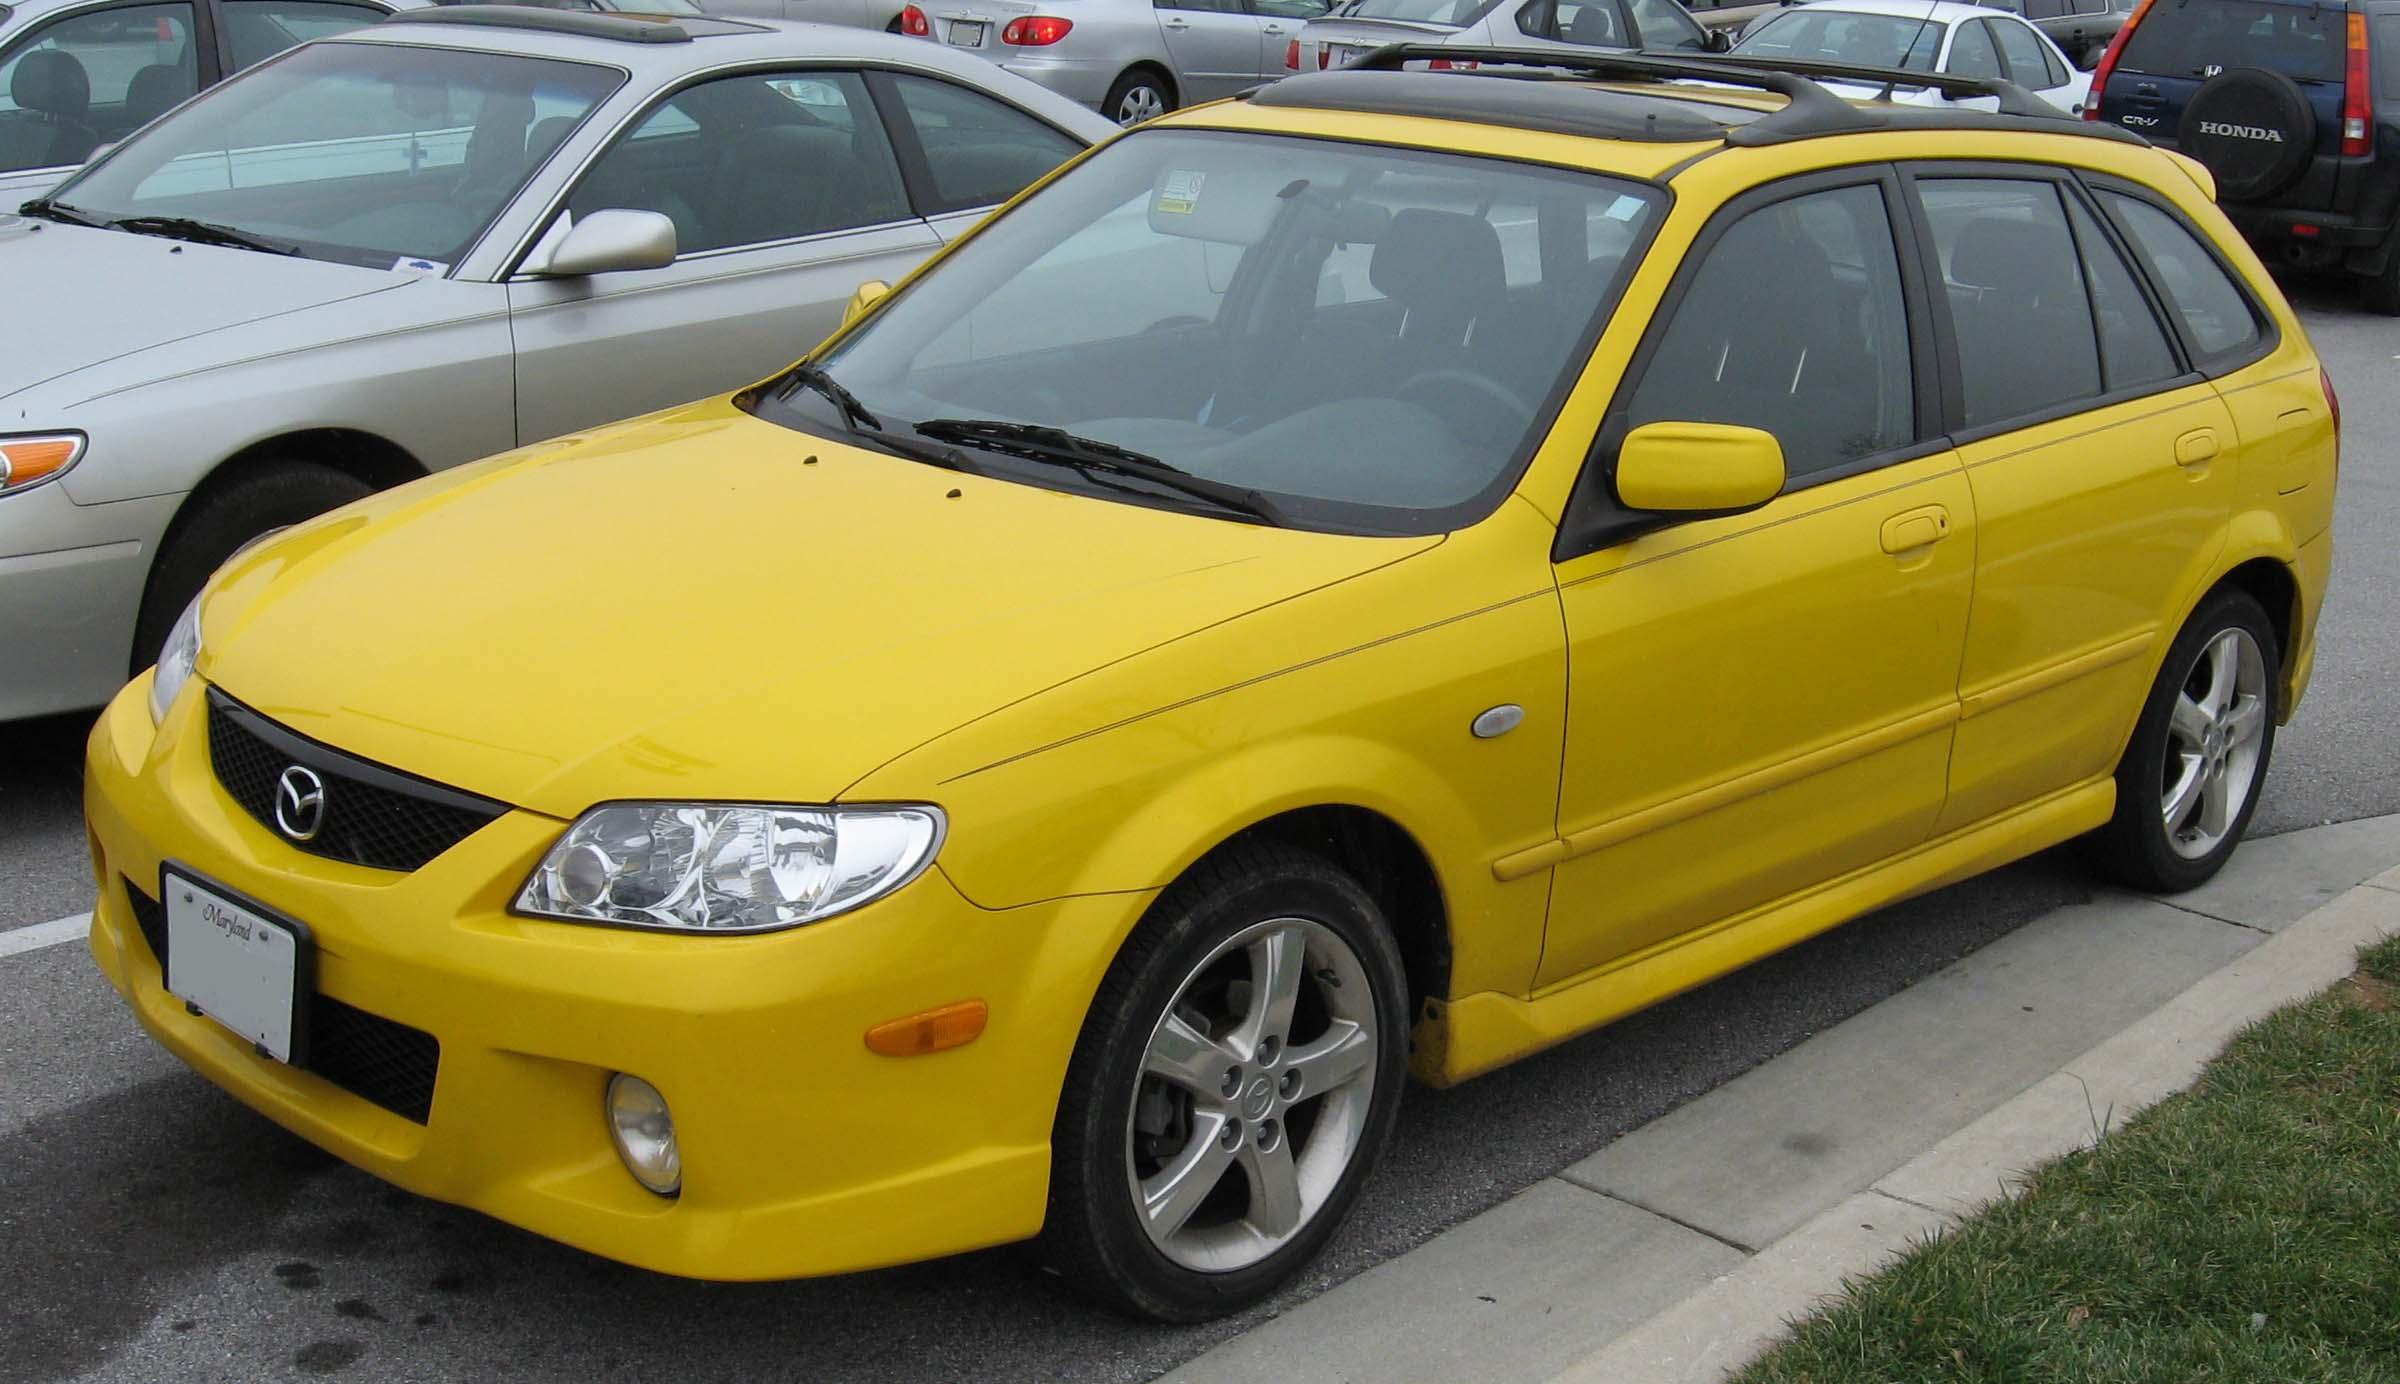 File:Mazda Protege5.jpg - Wikipedia, the free encyclopedia